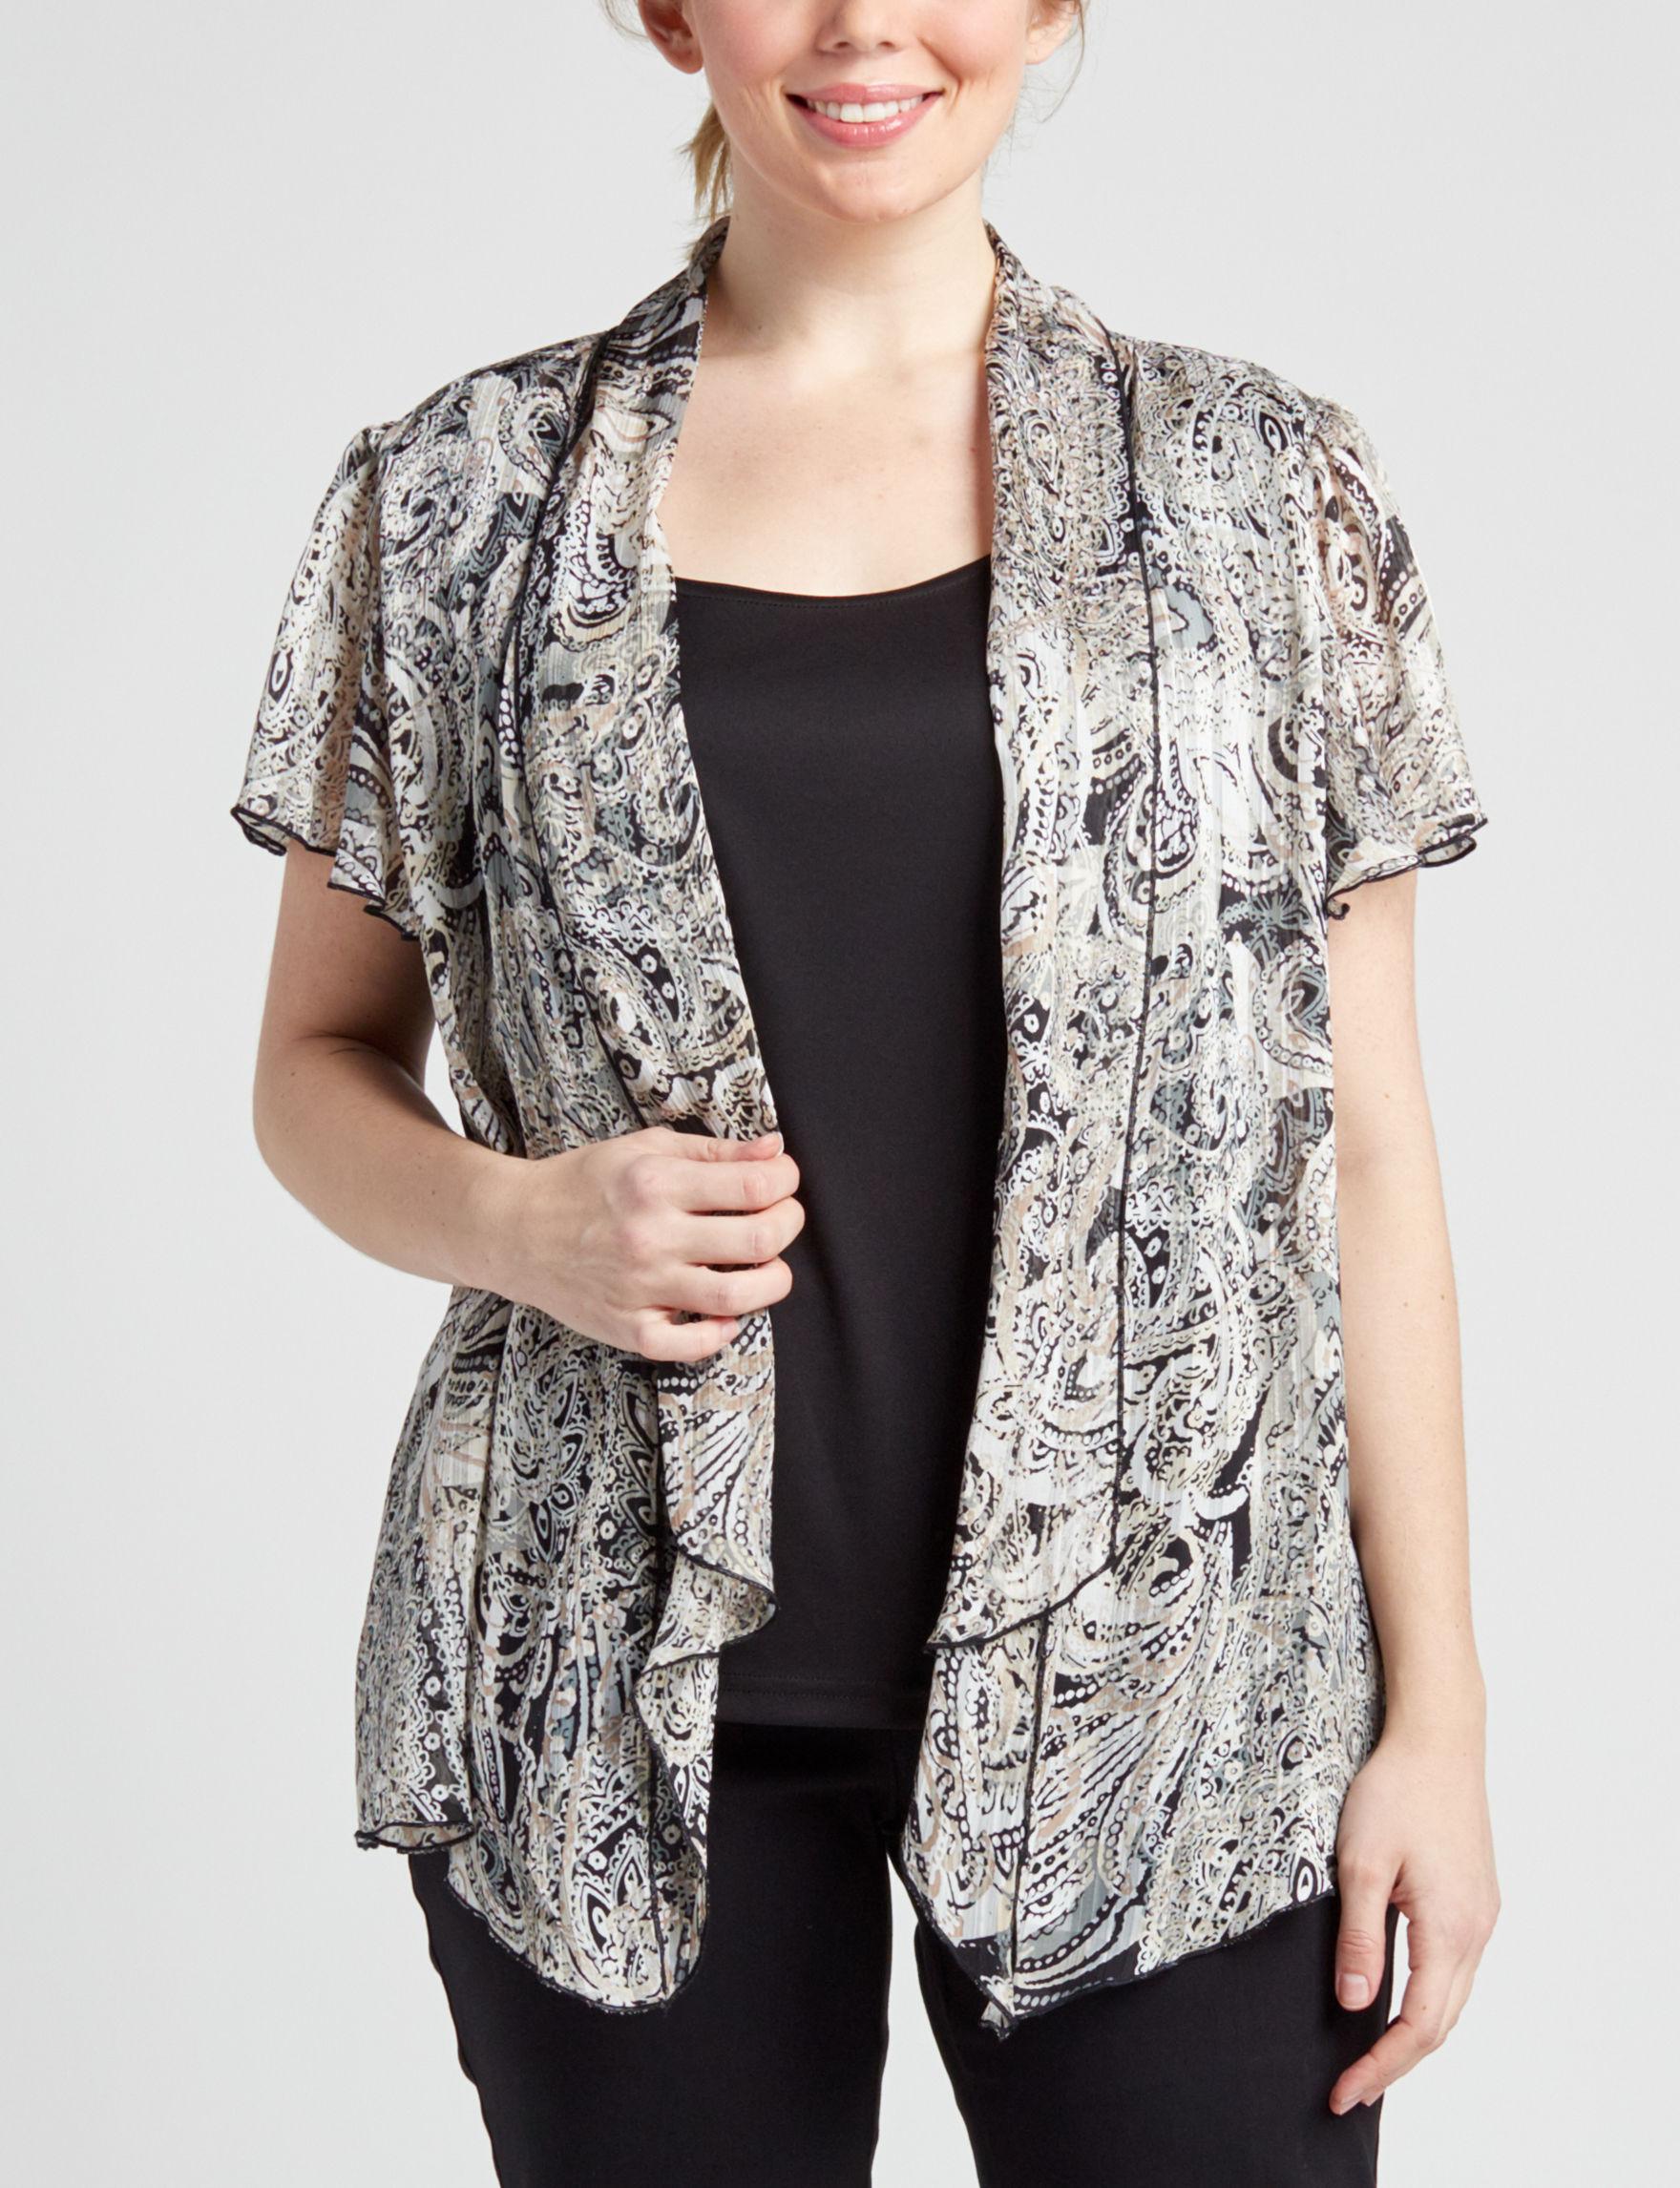 Sara Michelle Beige / Black Shirts & Blouses